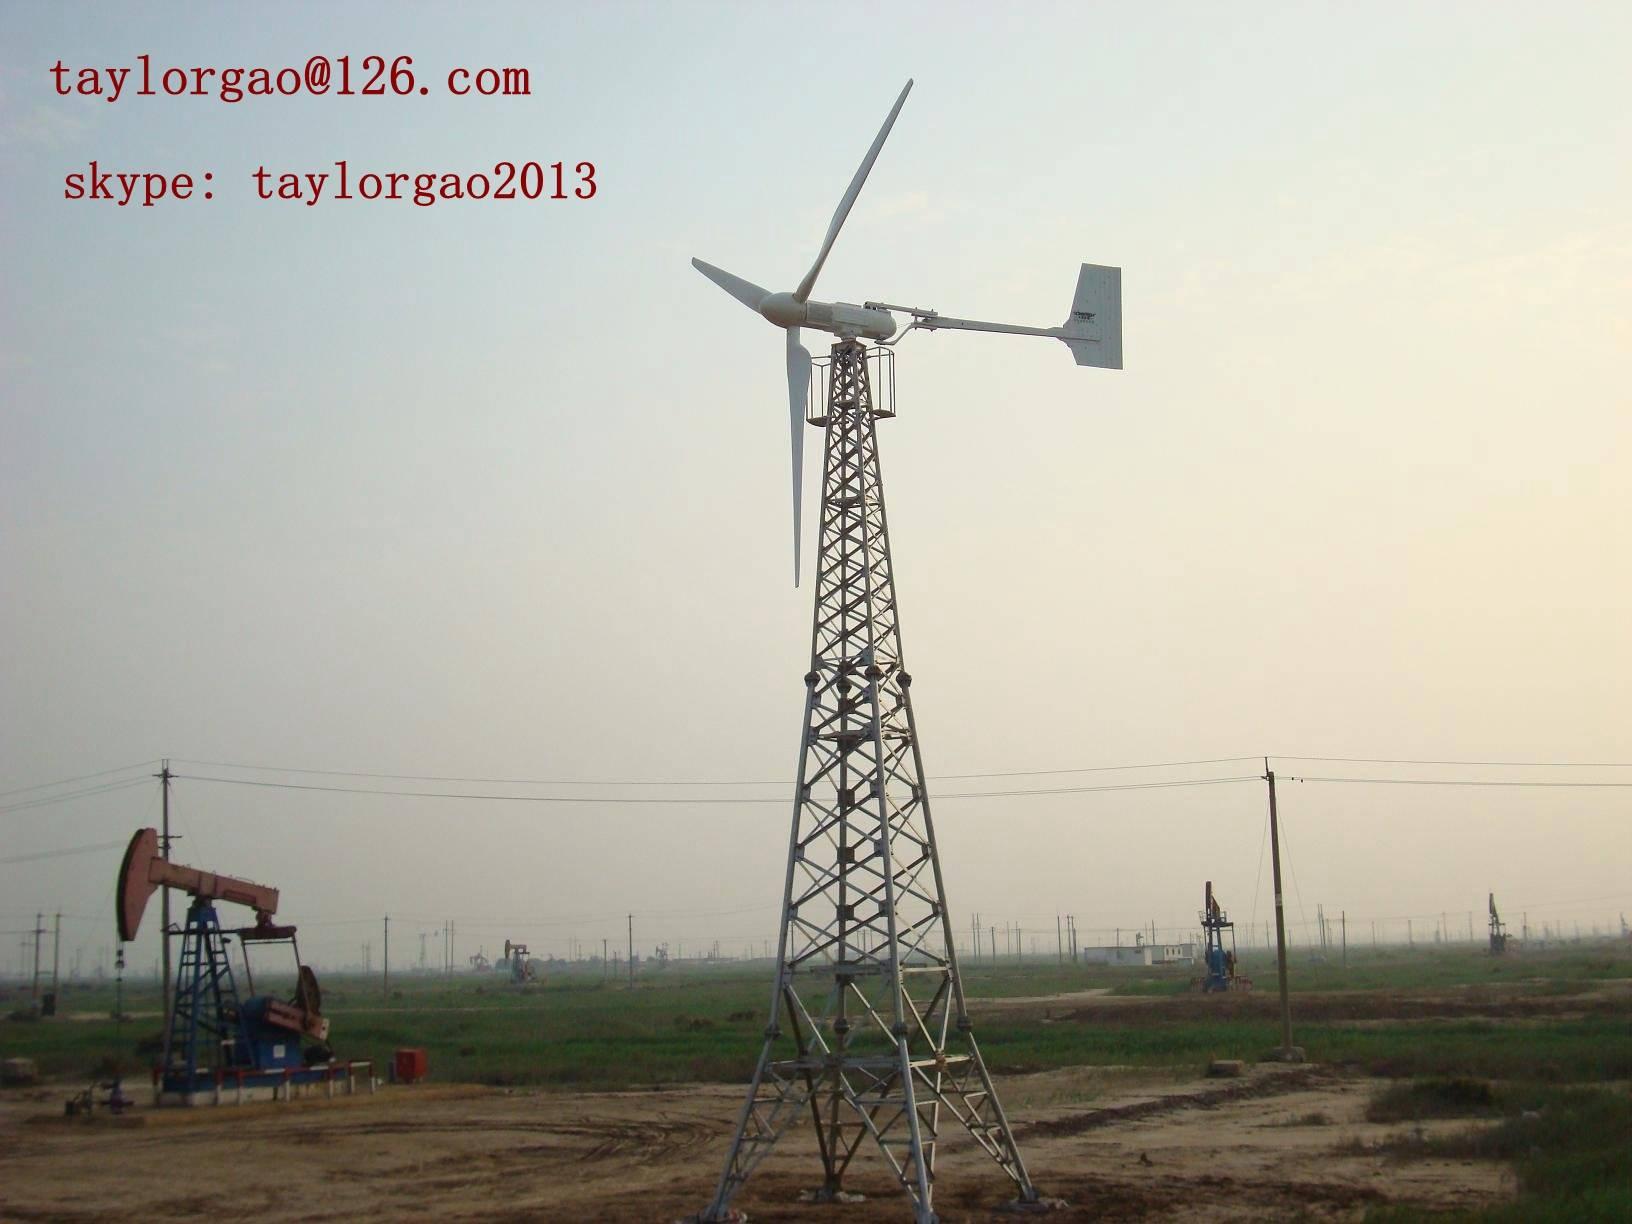 YANENG 10kw wind turbine, wind power system for household, farm, water pumping